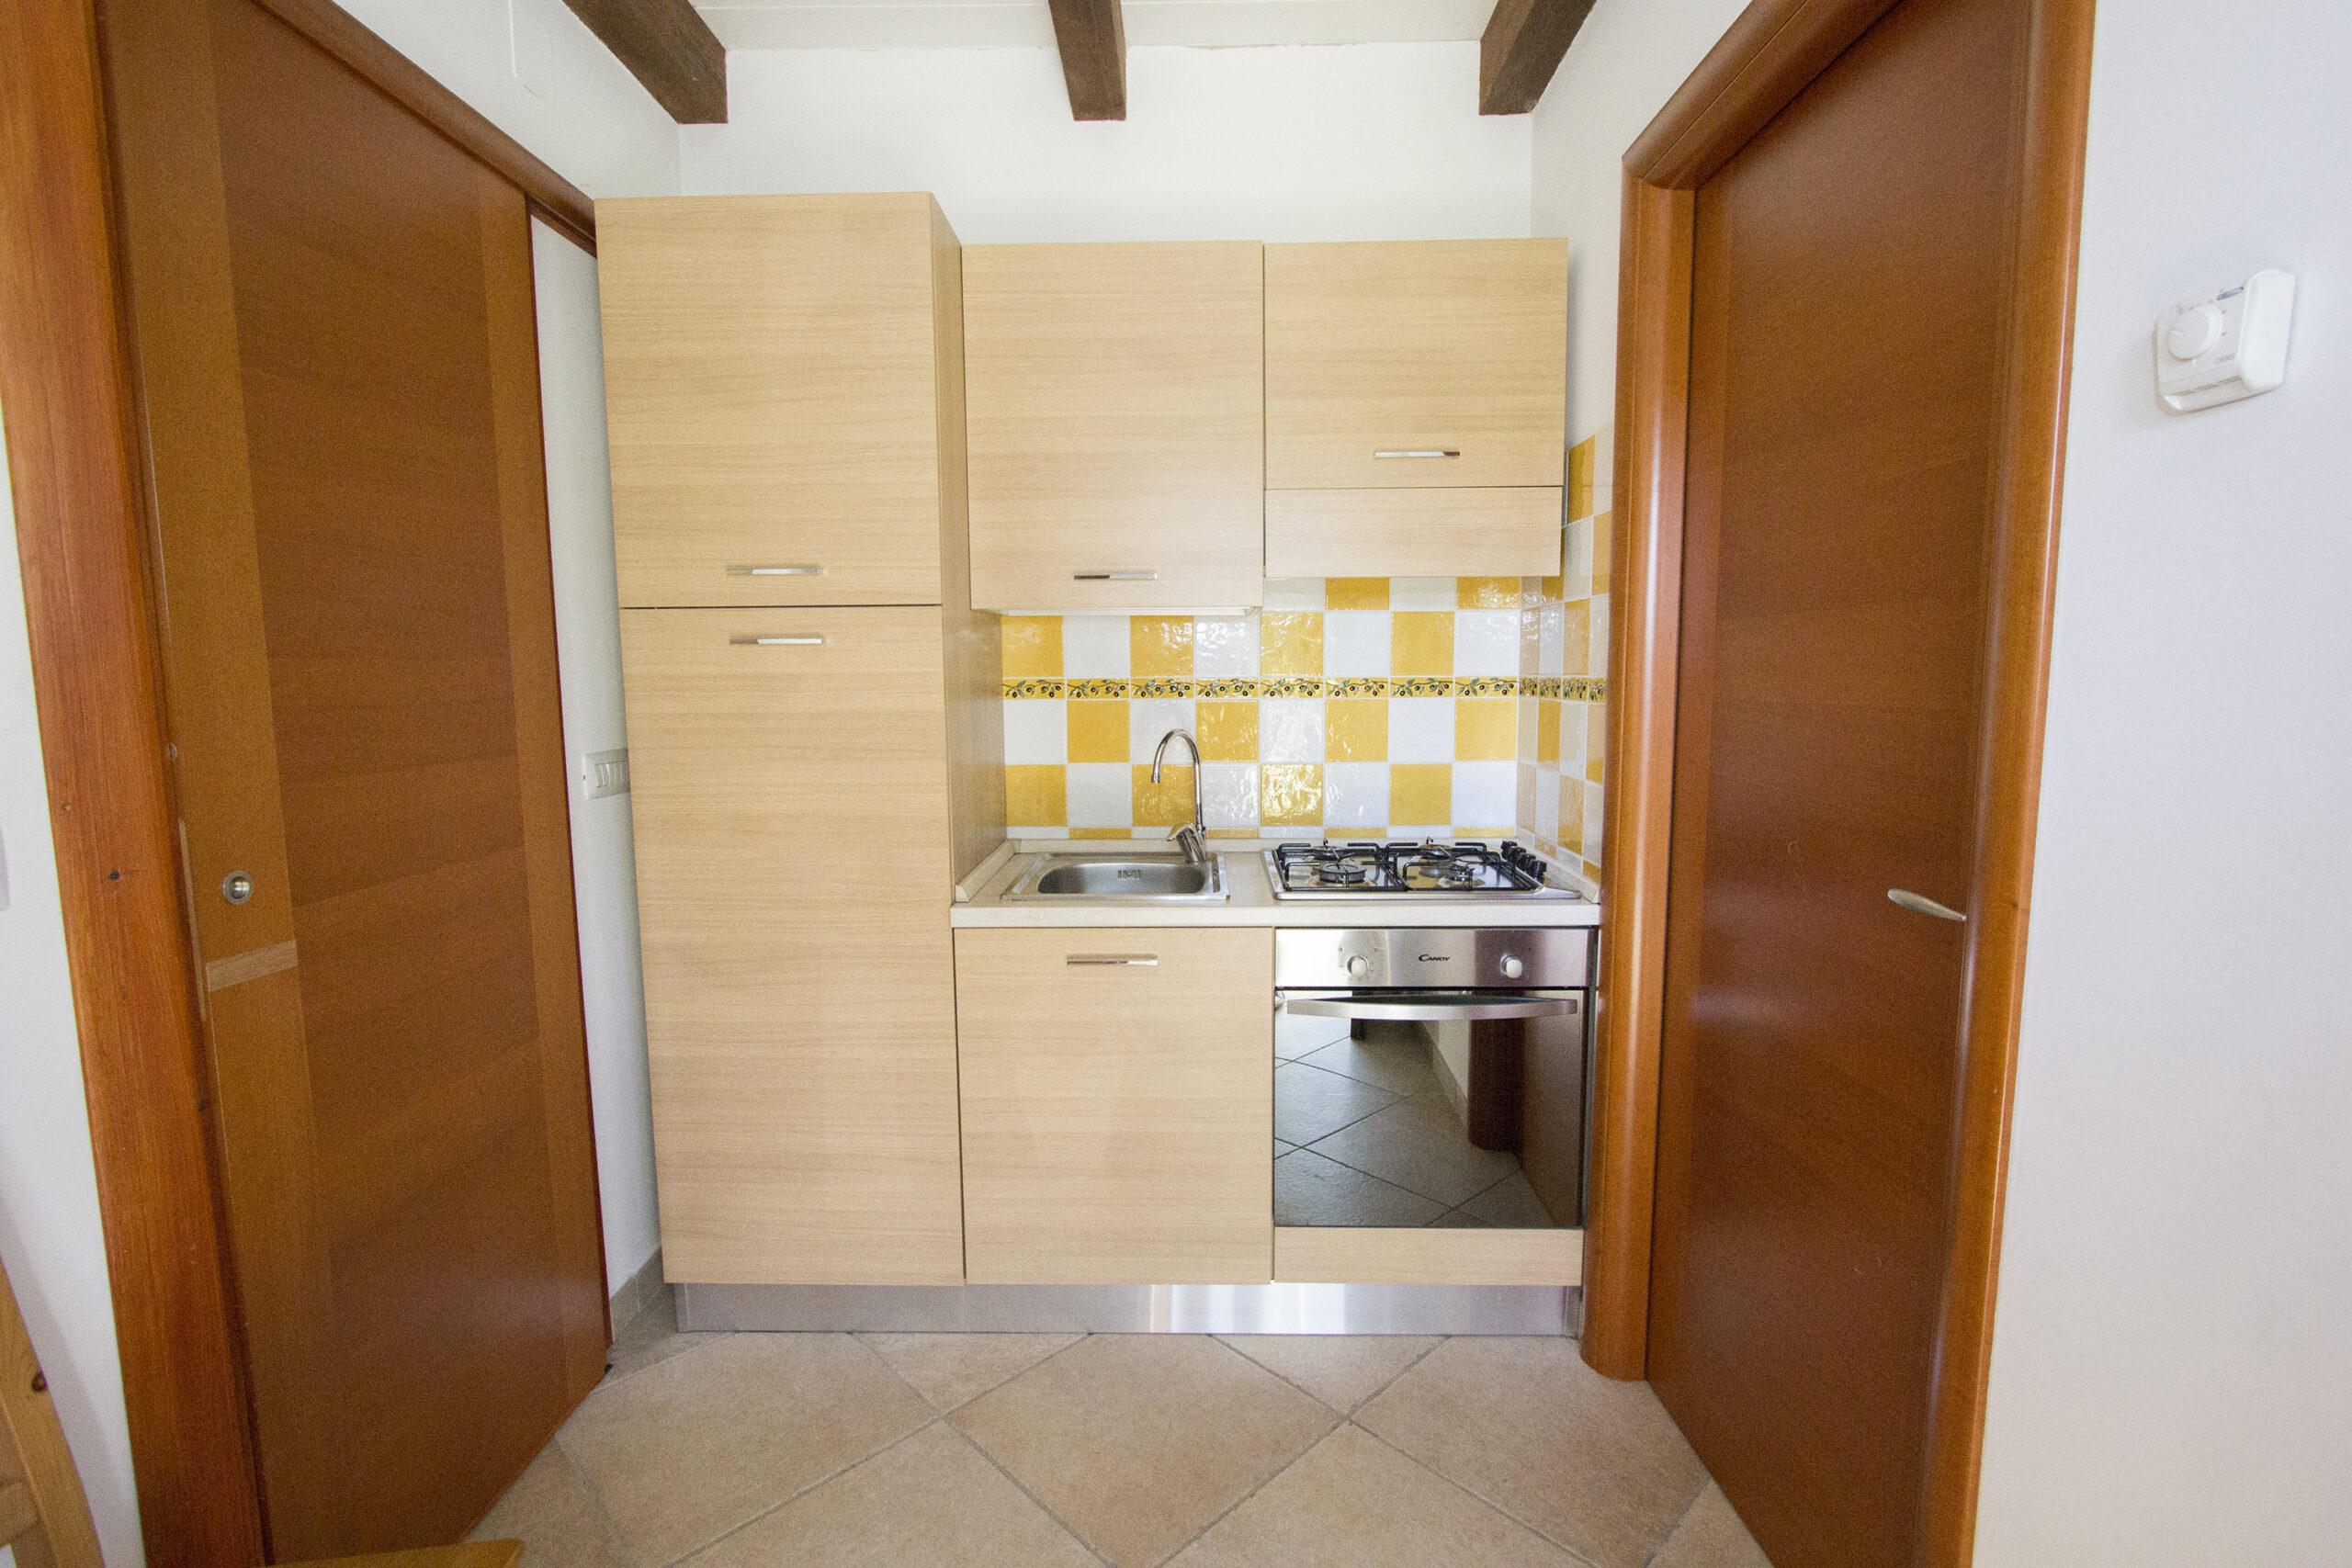 la-sorgente-cucina-piano-inferiore